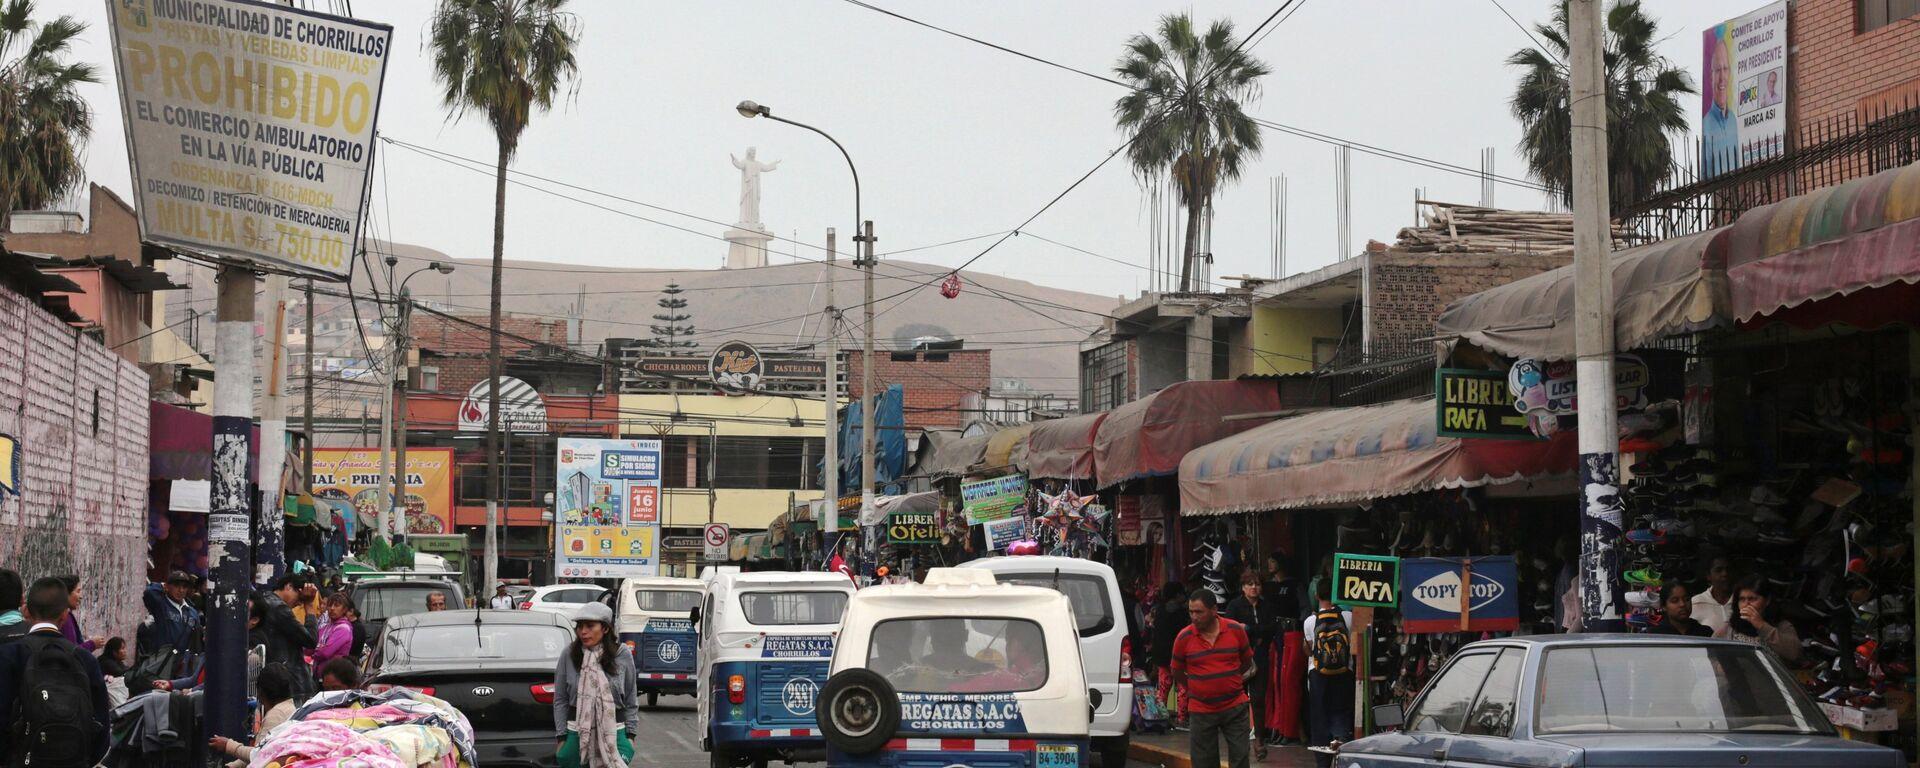 Lima, la capital de Perú - Sputnik Mundo, 1920, 10.02.2021